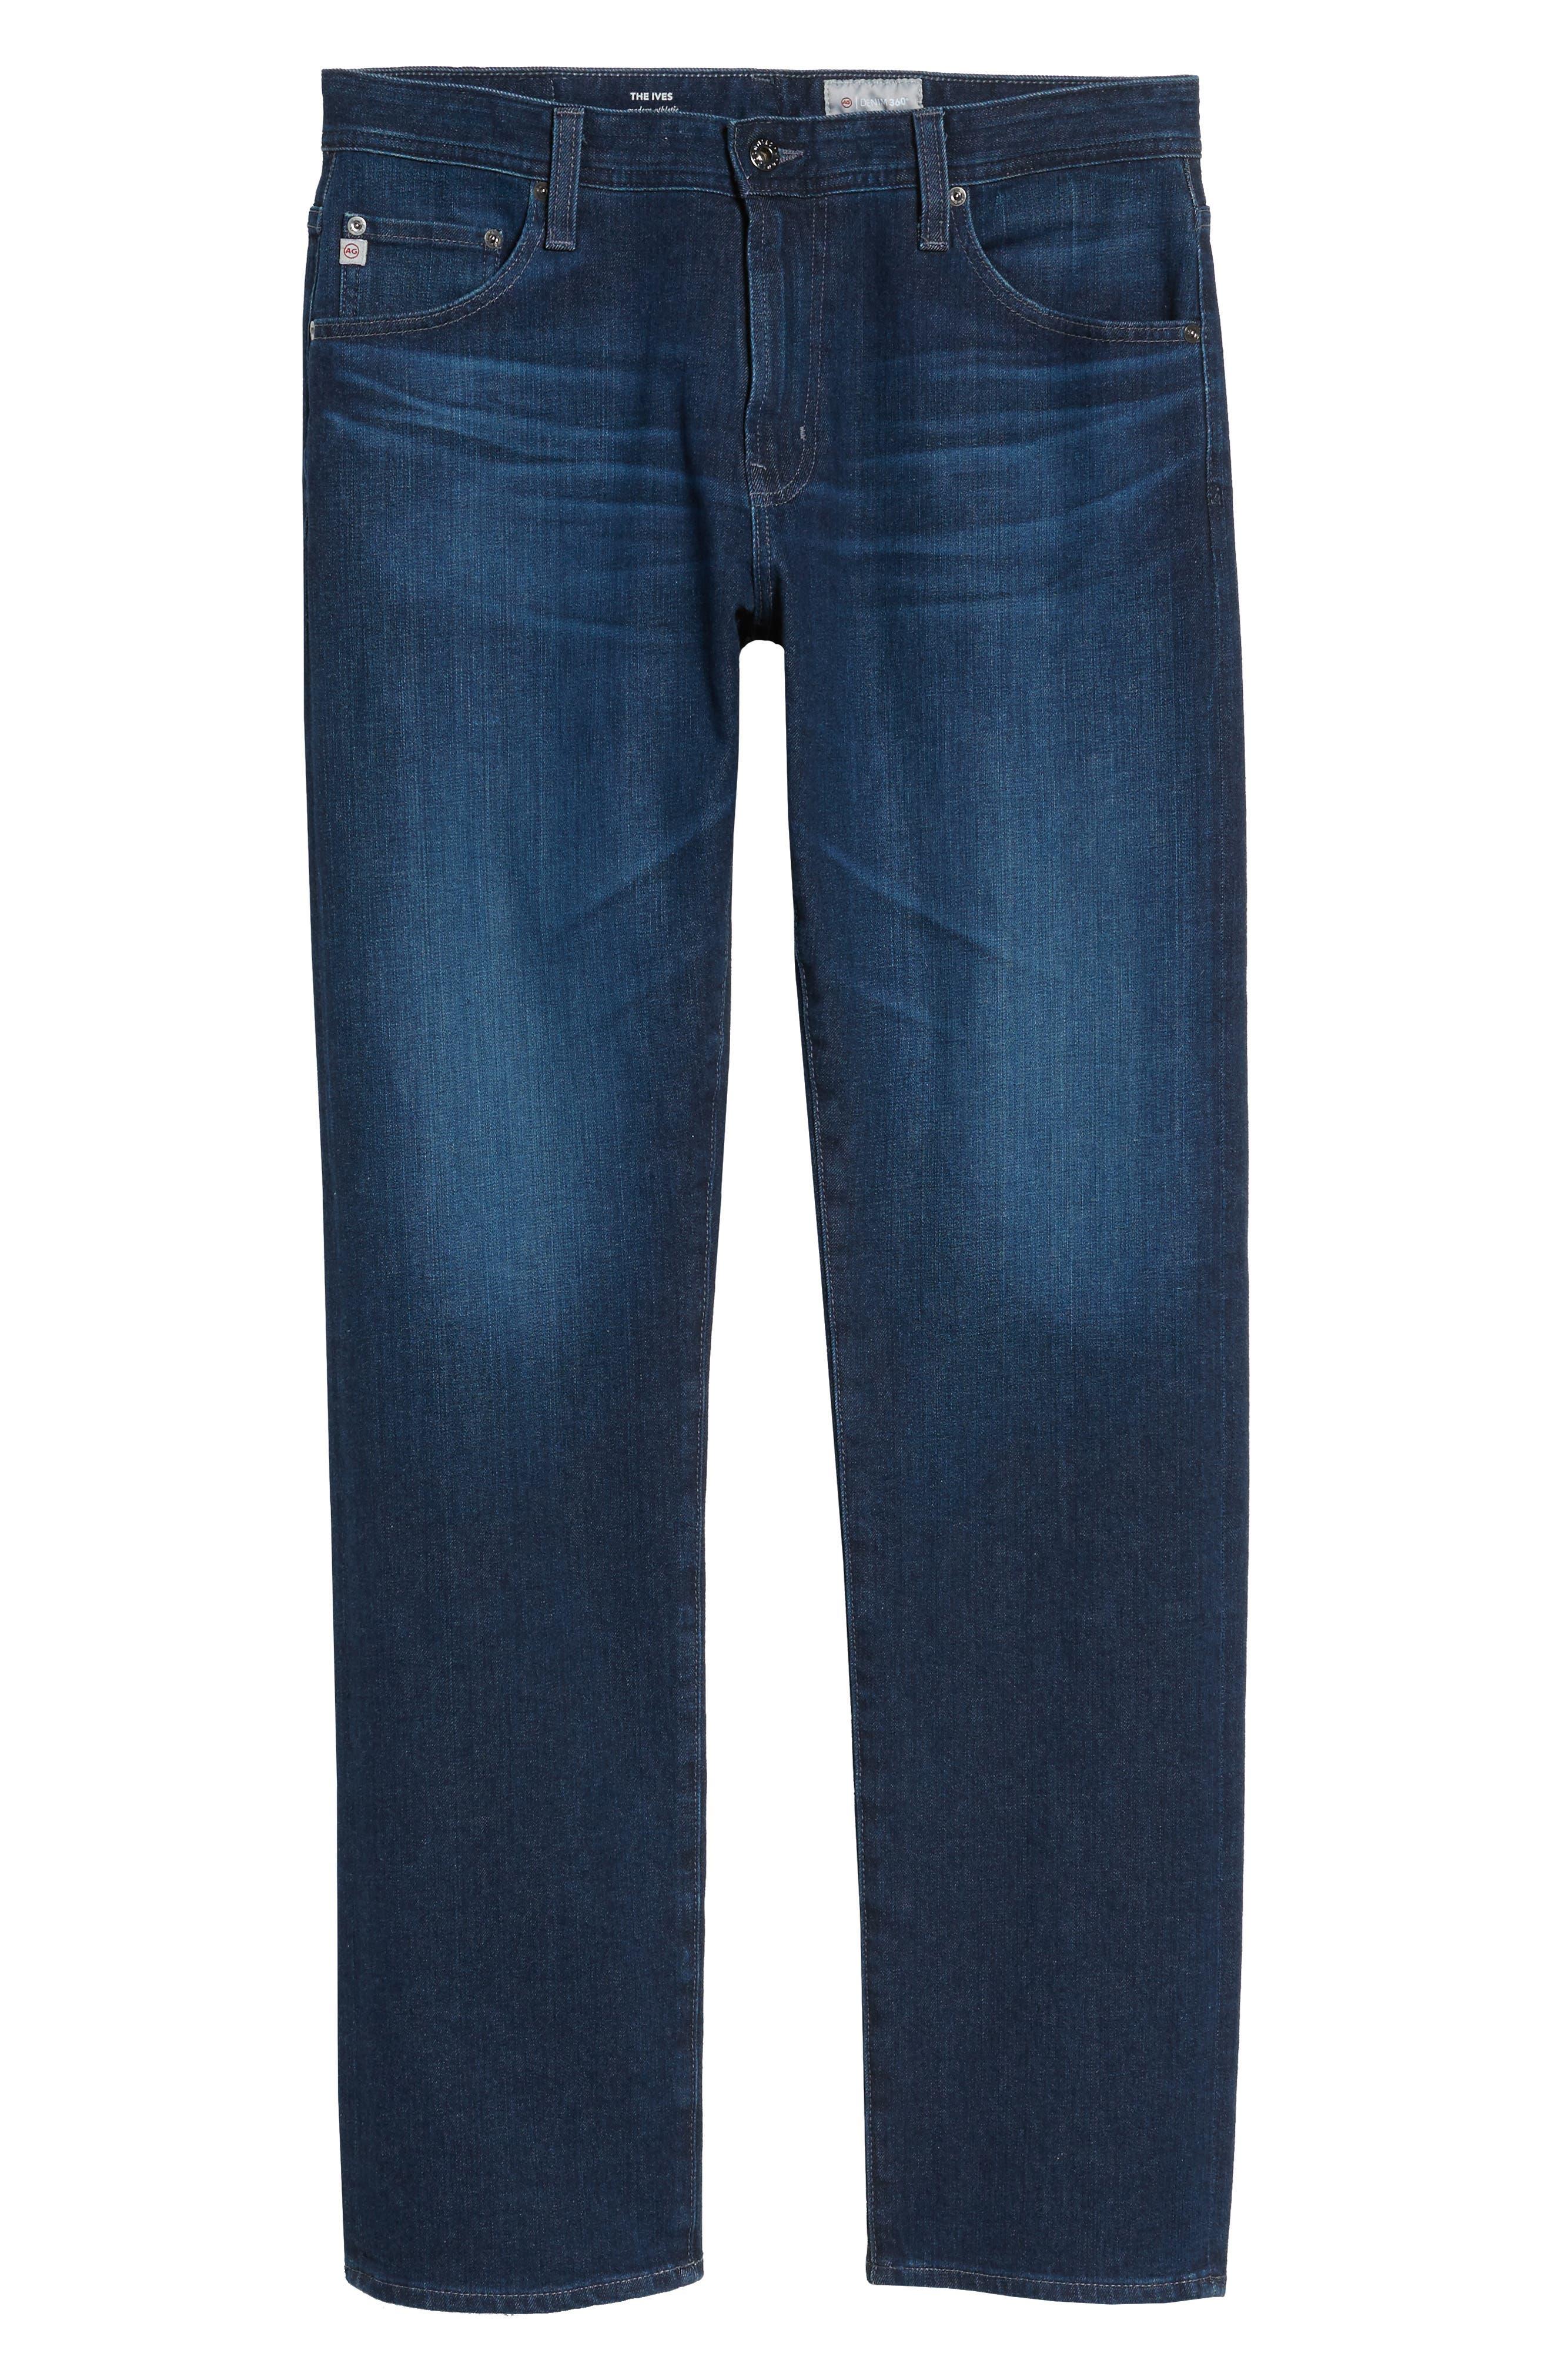 Ives Straight Leg Jeans,                             Alternate thumbnail 6, color,                             407